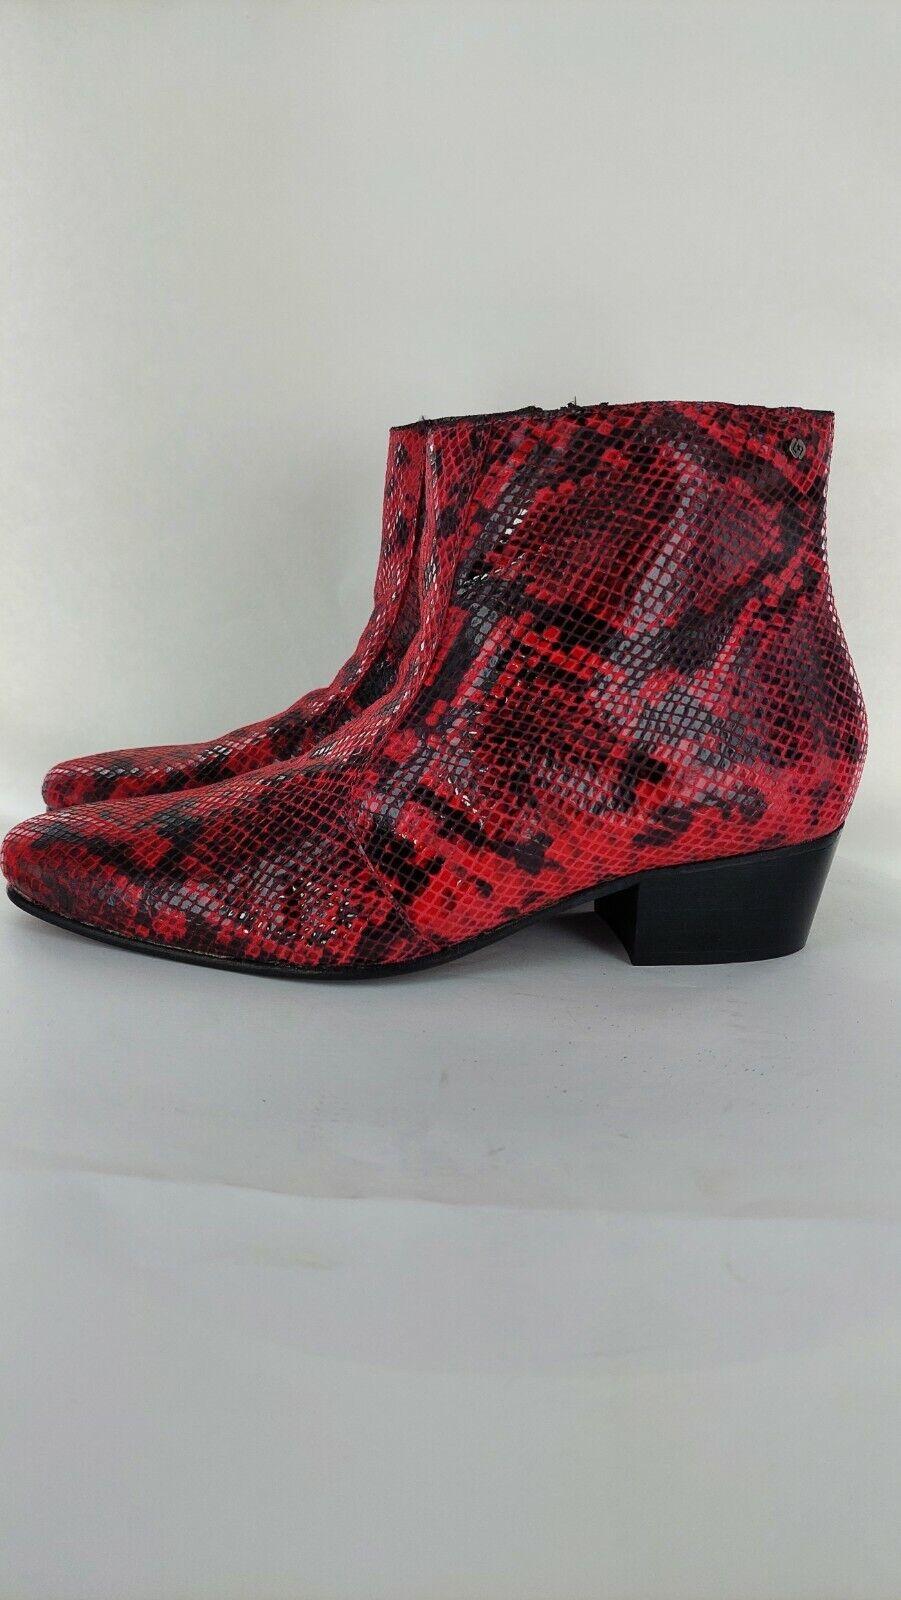 Club Cubano ROMARIO Mens Handmade Leather Cuban Heels Boots Python Red UK9#849